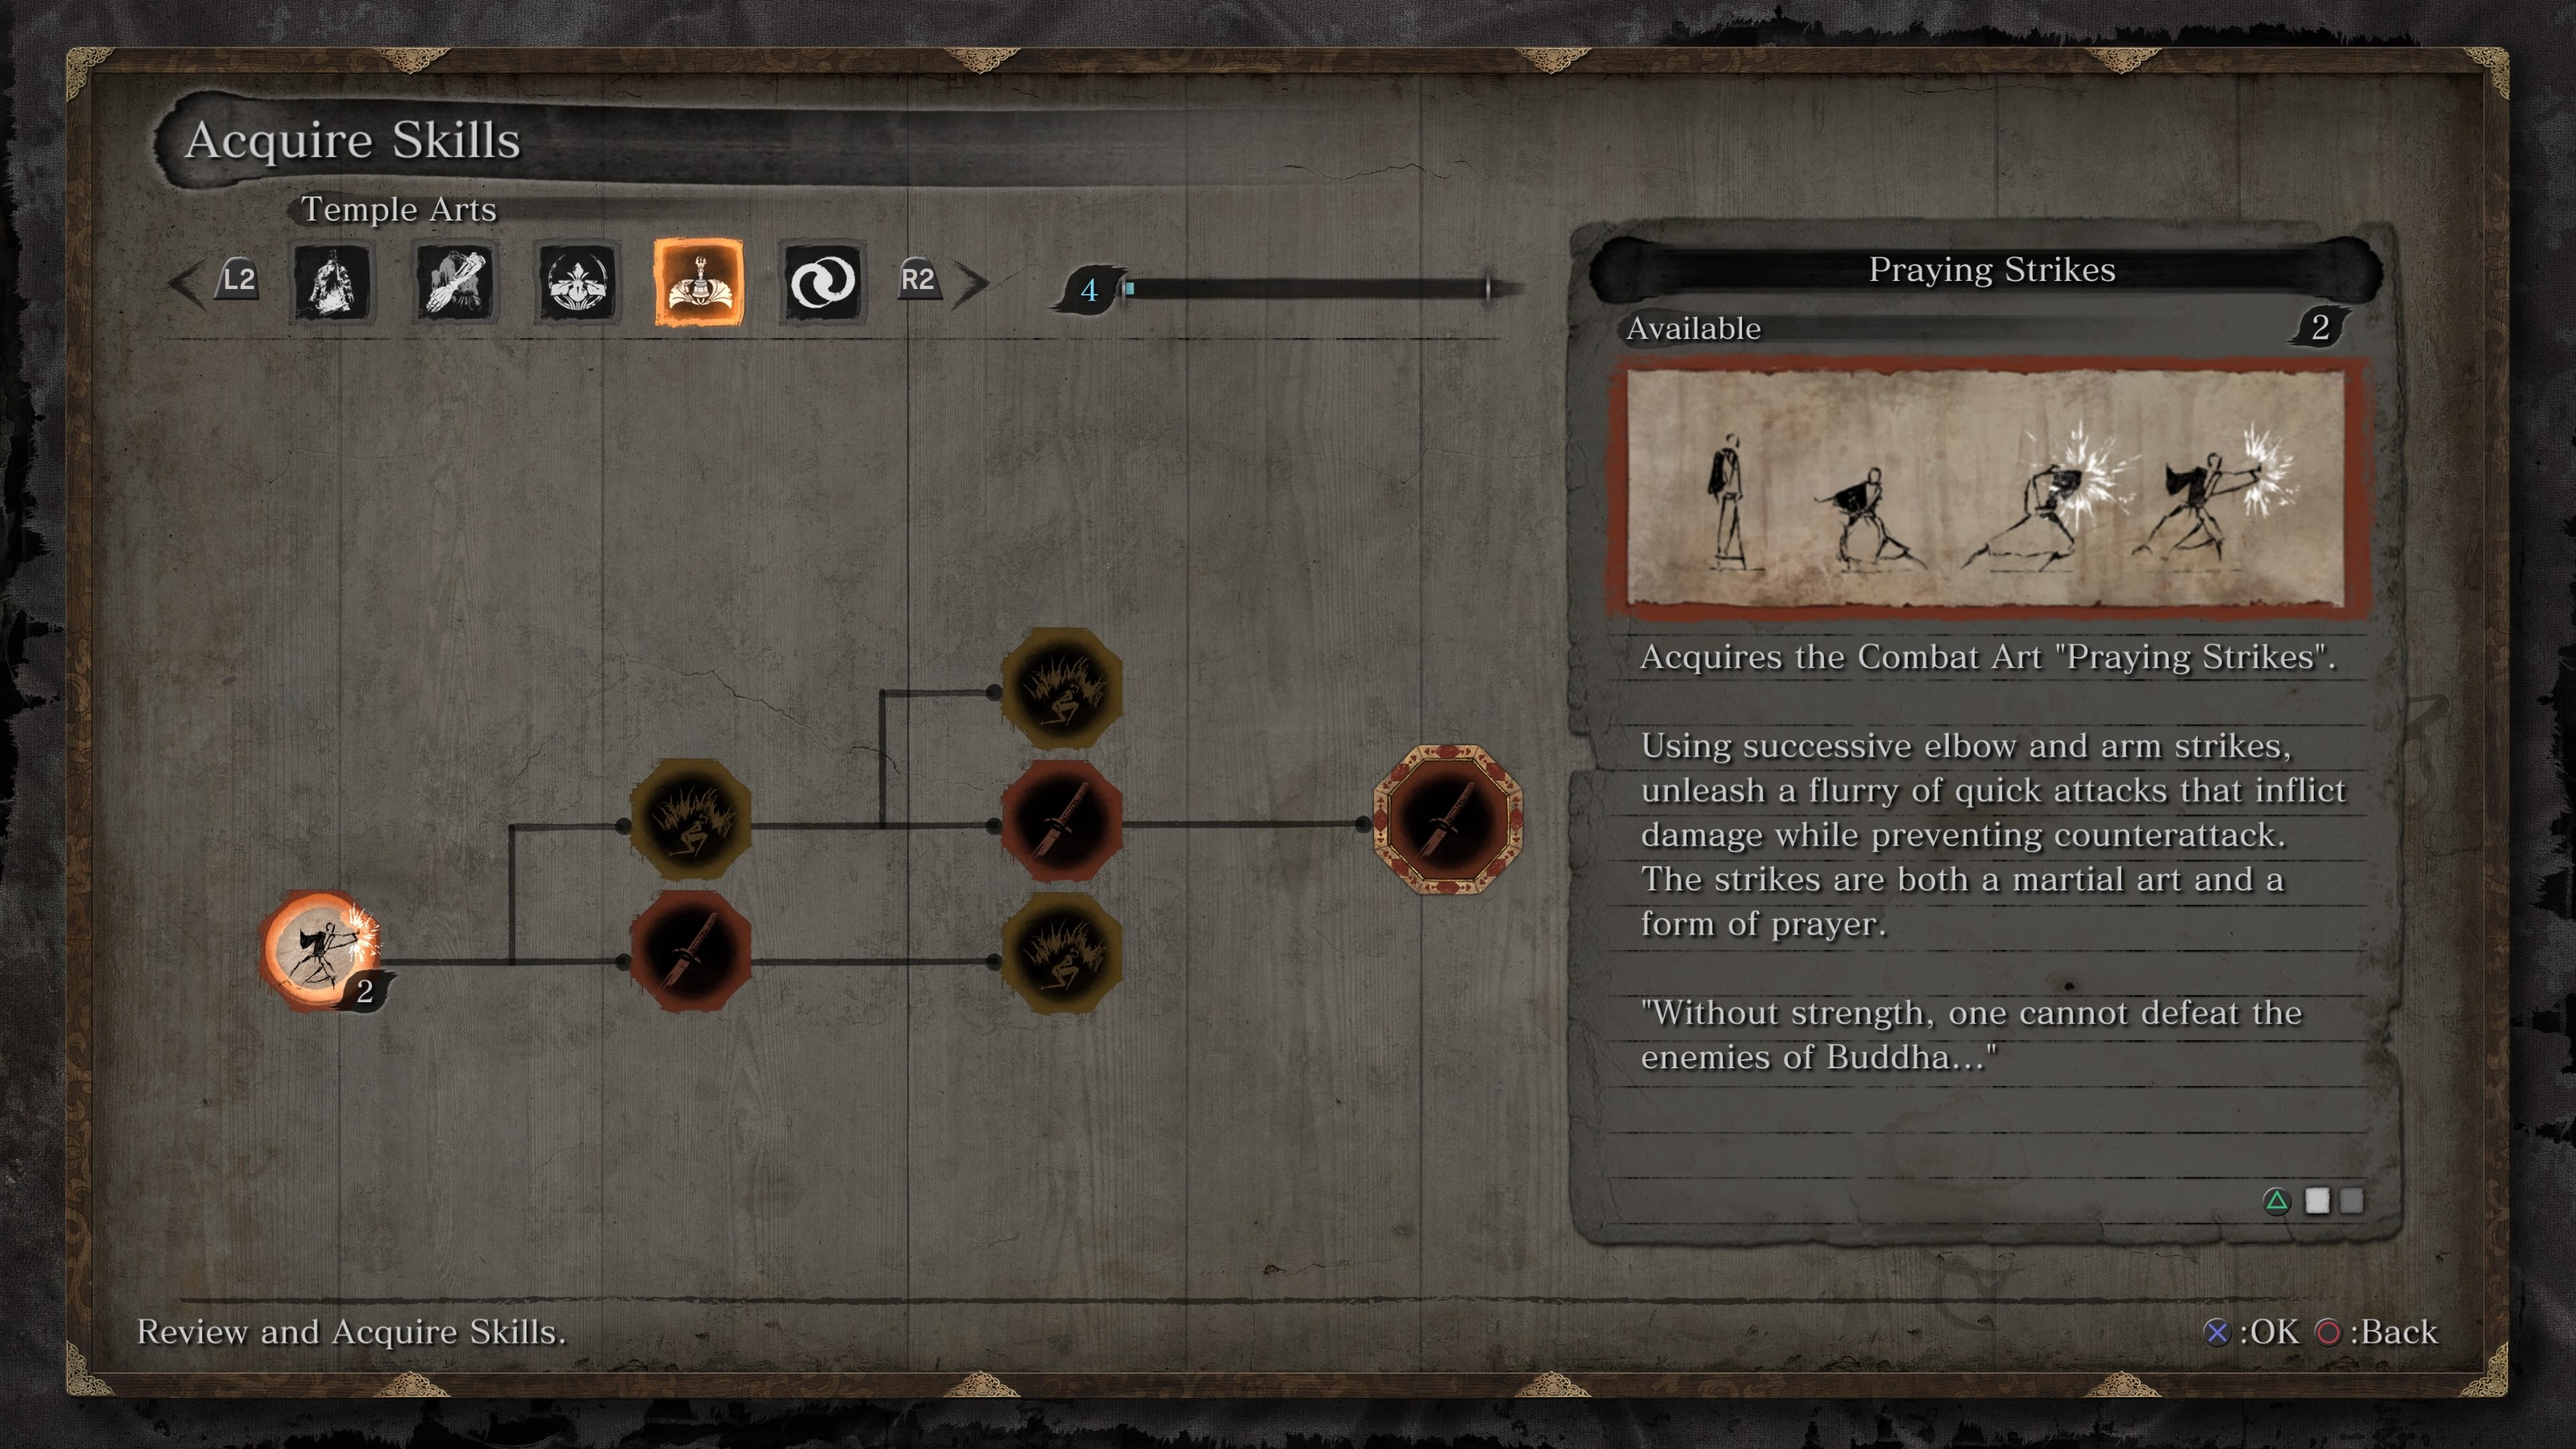 The best Combat Arts in Sekiro: Shadows Die Twice